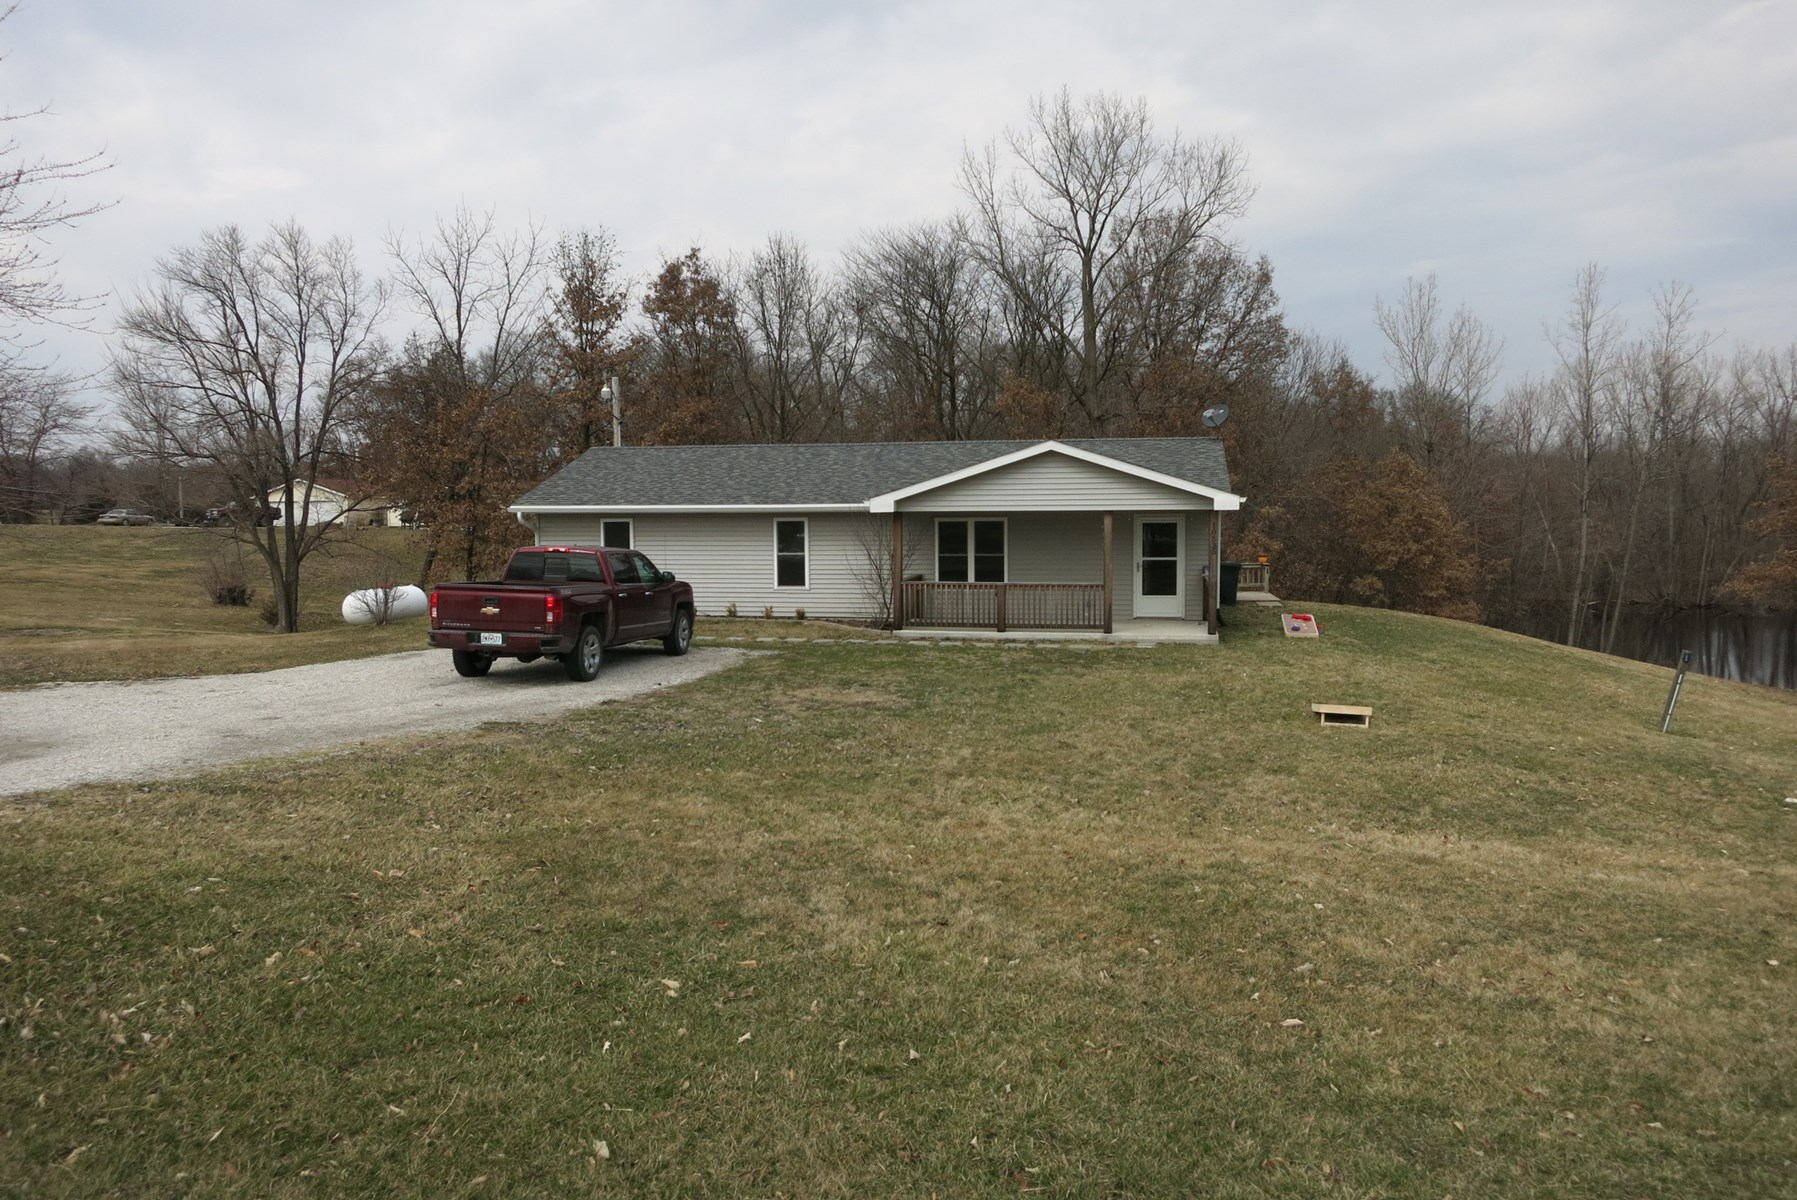 Ranch Home on Small Acreage Close to Bethany MO